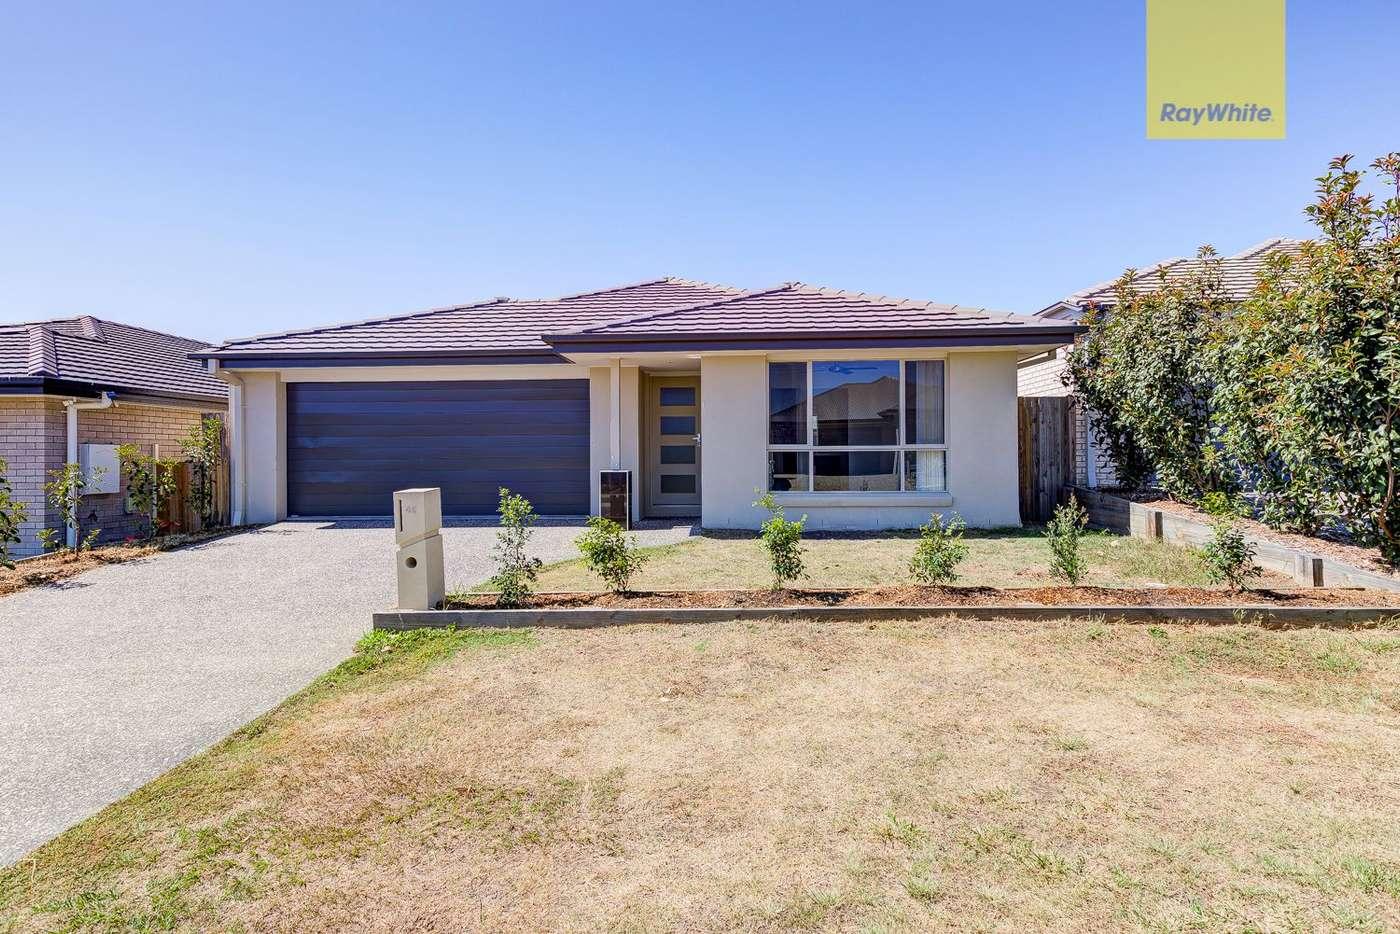 Main view of Homely house listing, 46 Treeline Circuit, Yarrabilba, QLD 4207